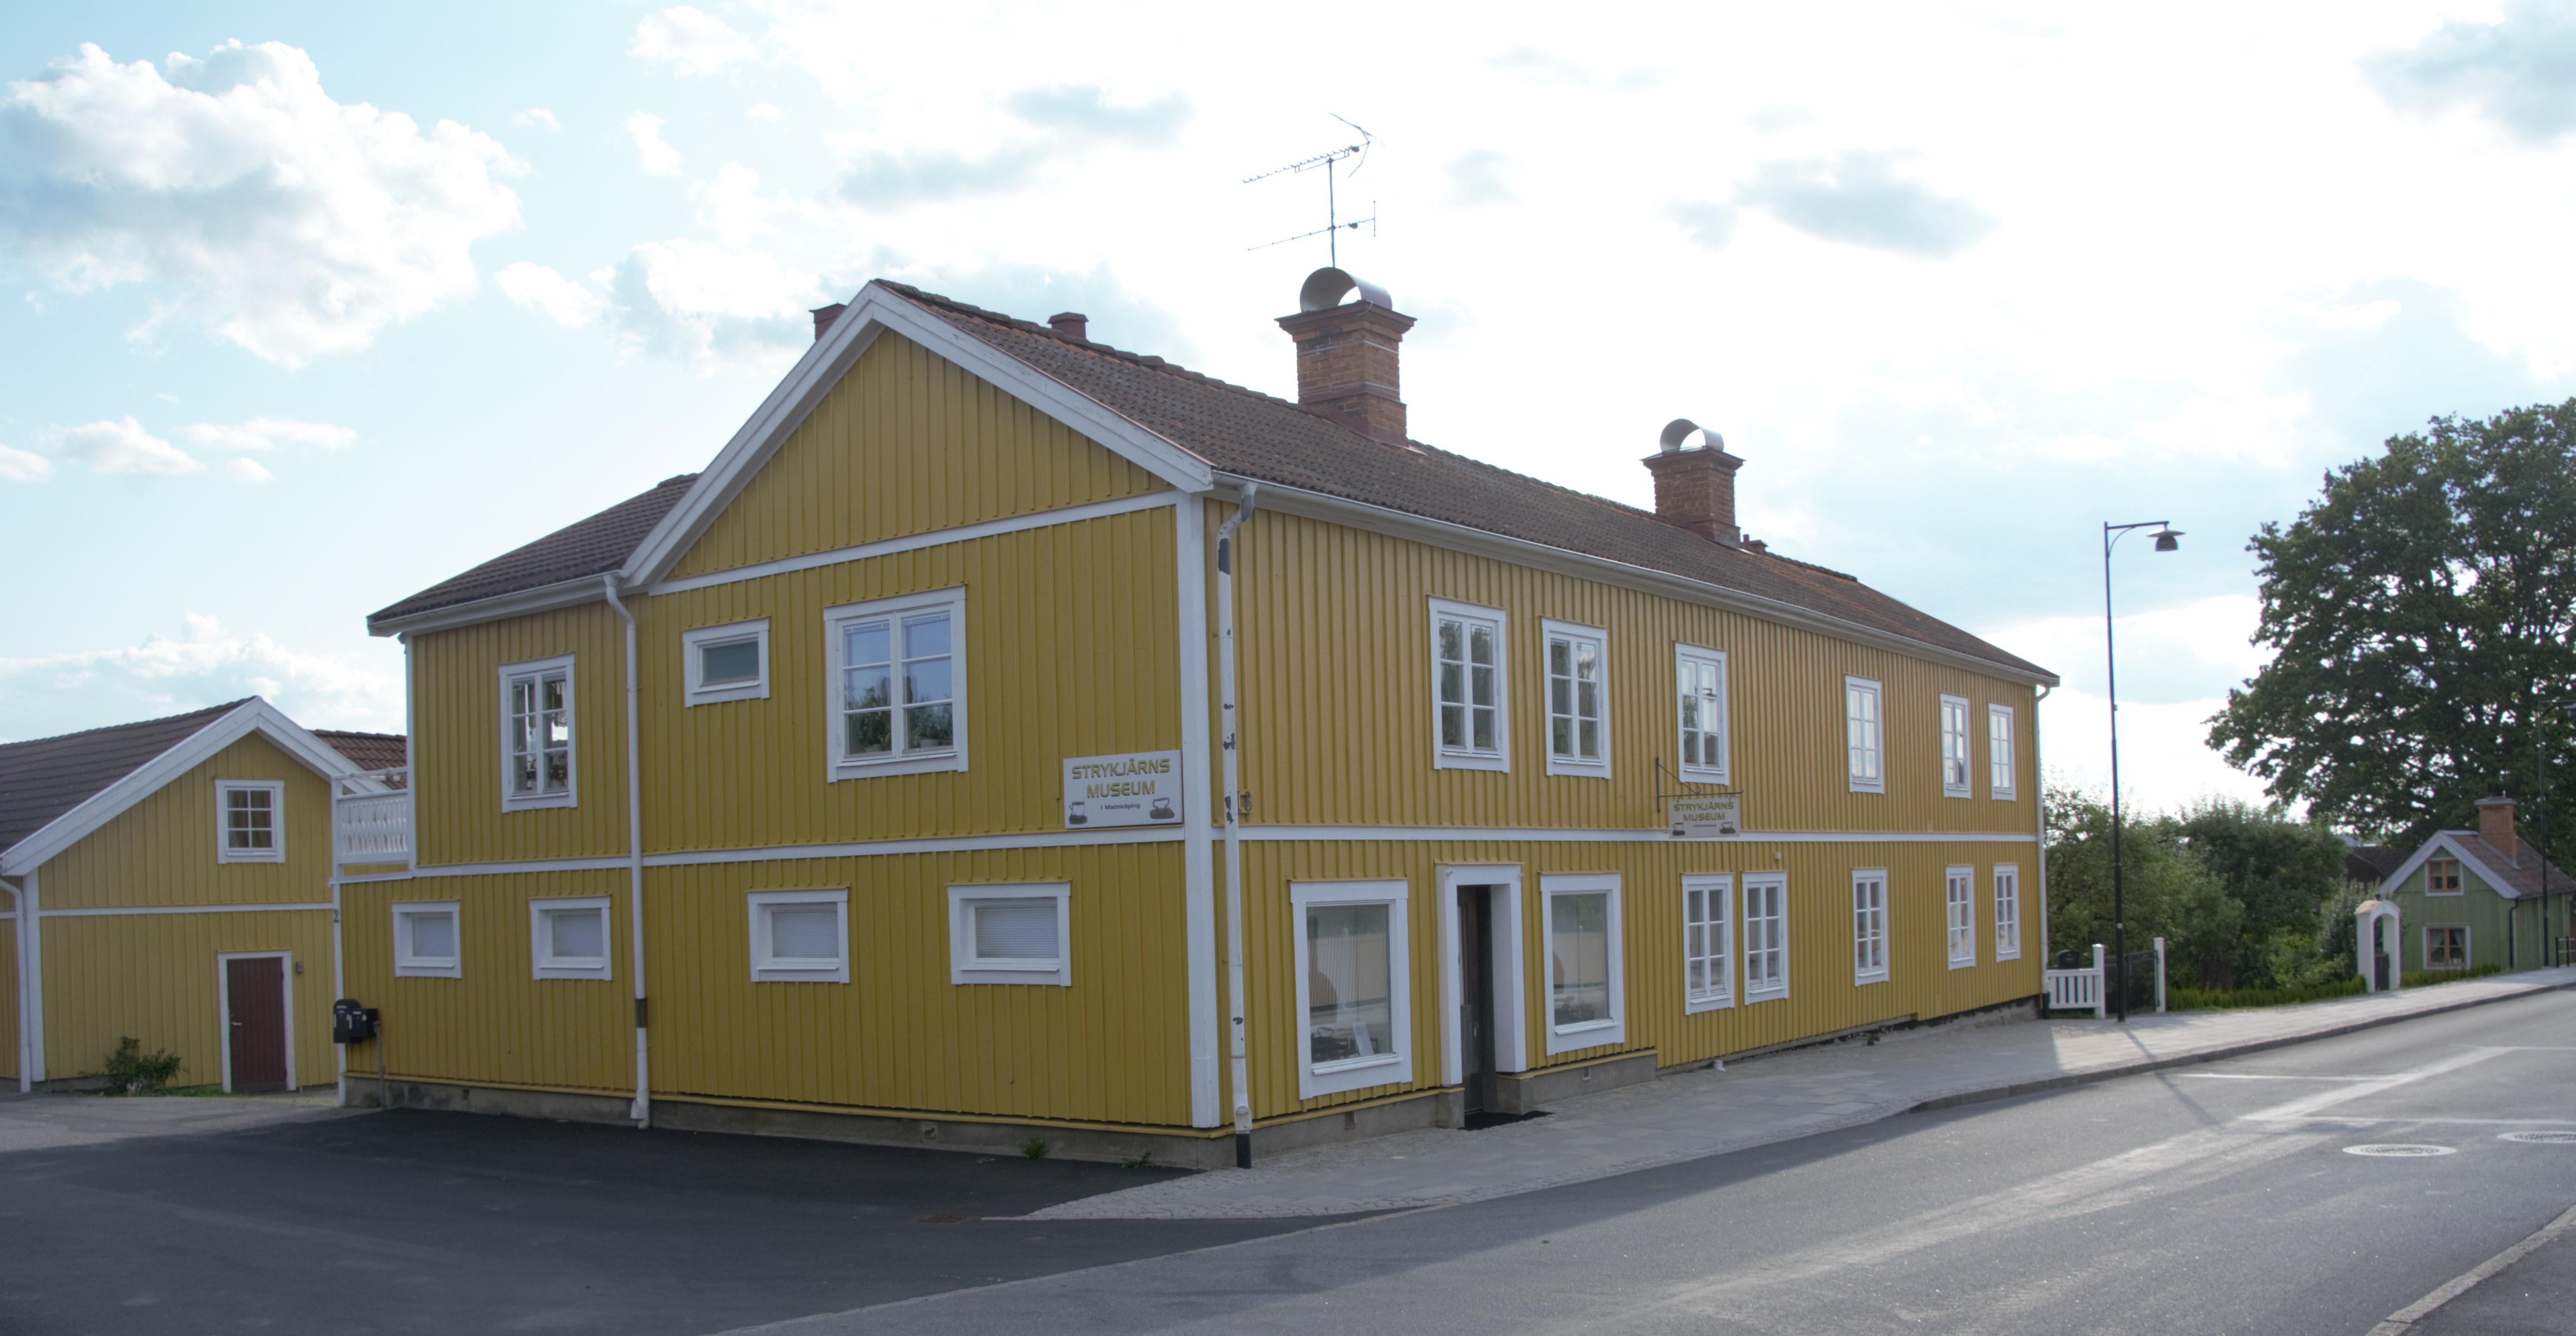 malmköping dating site